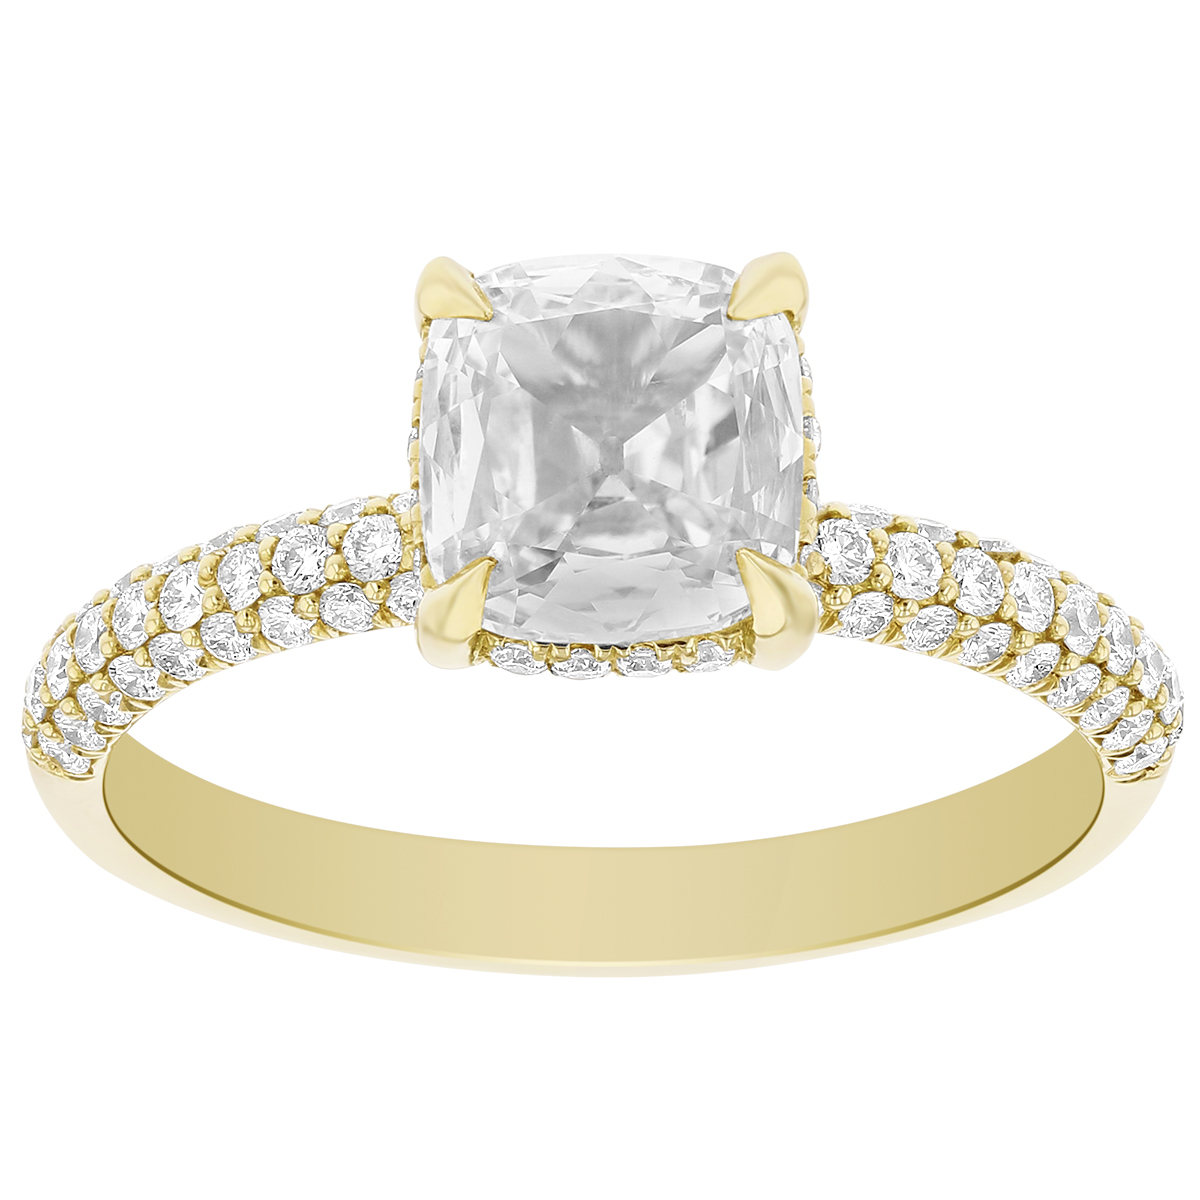 Elege 18K Yellow Gold Cushion Diamond Ring With Diamond